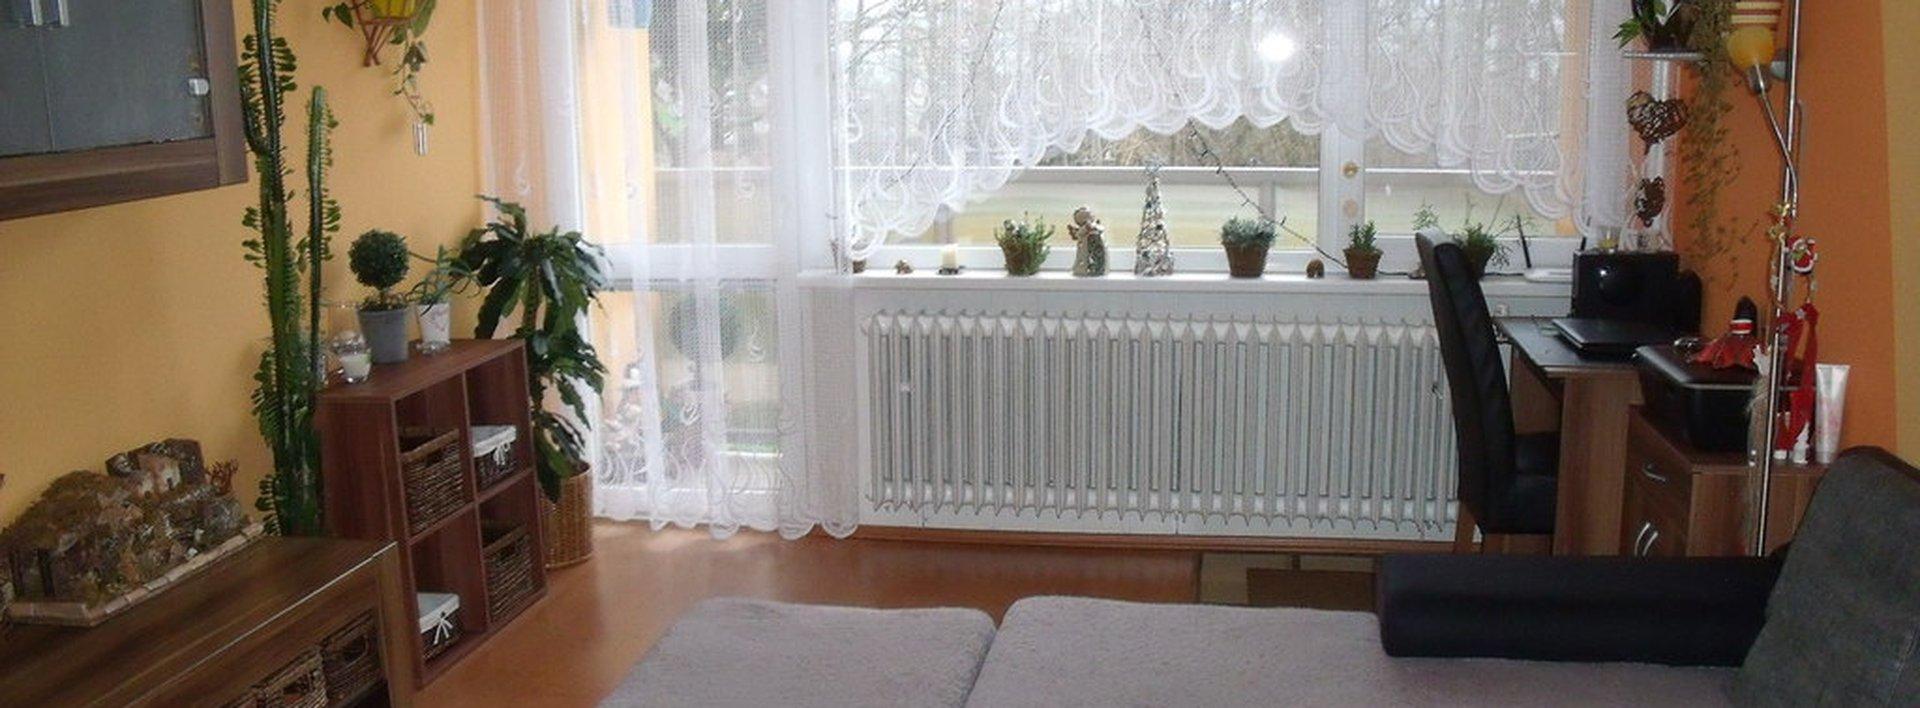 Prodej velmi hezkého bytu 3+1/L a komorou v Hrádku nad Nisou, Ev.č.: N47008